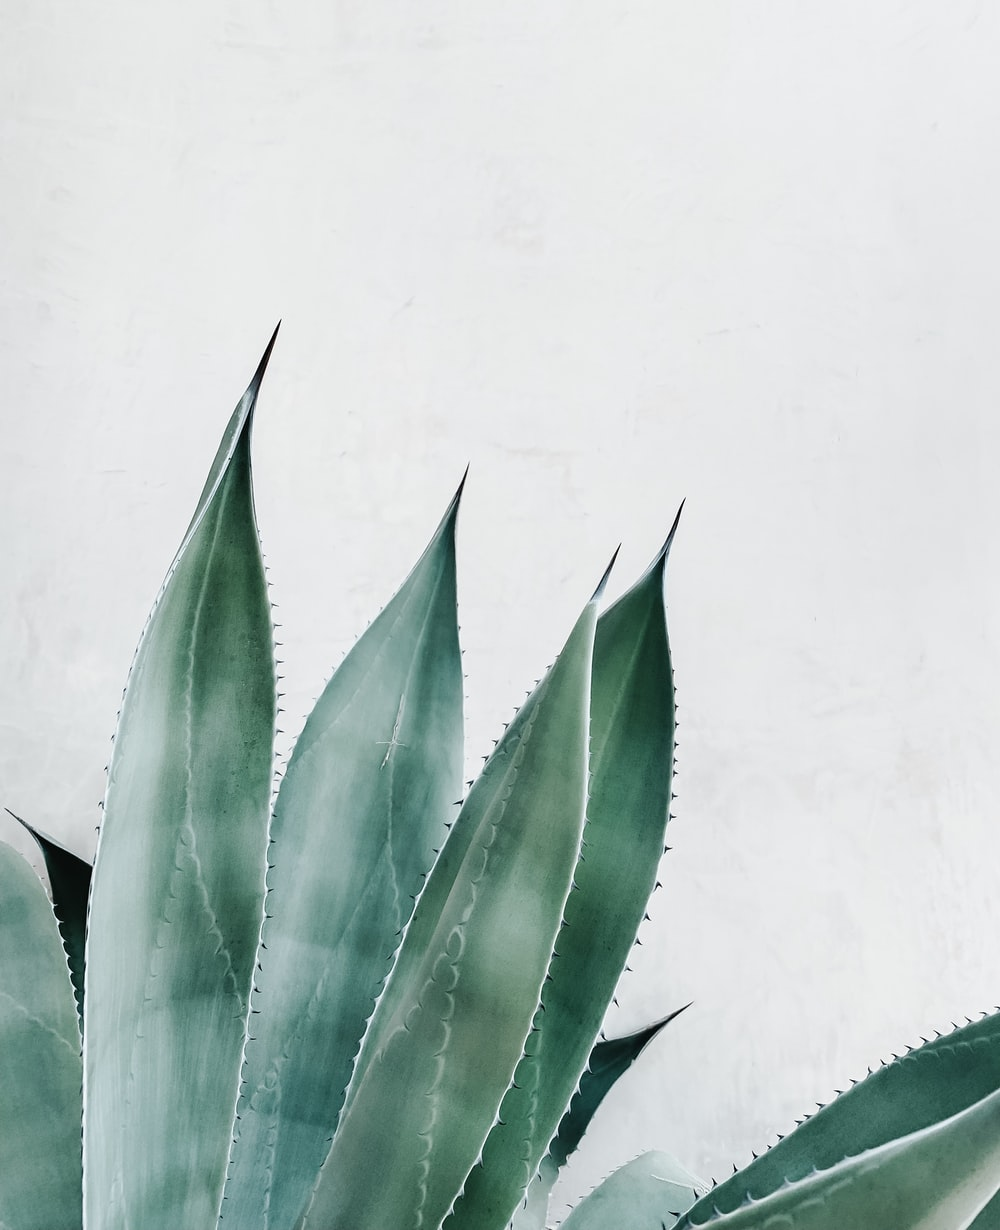 illustration of Aloe vera